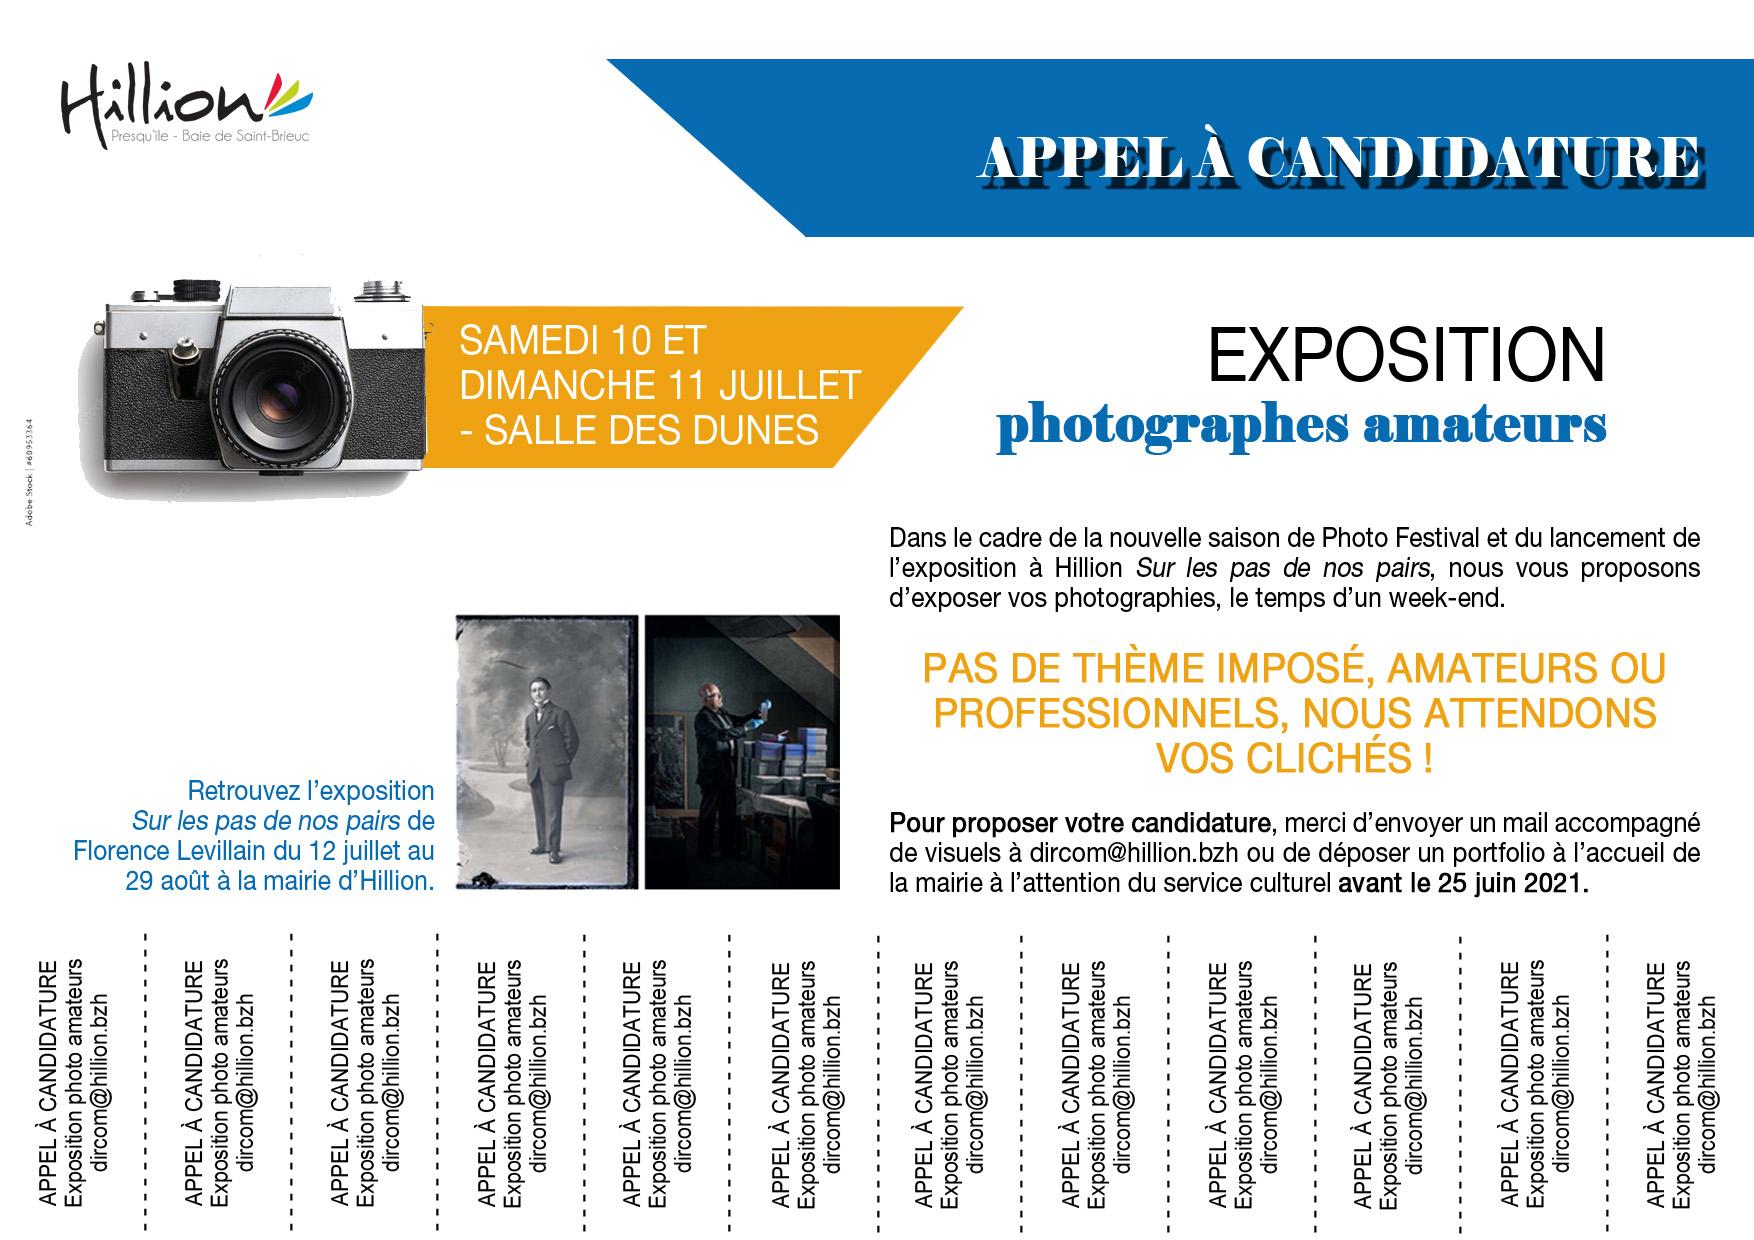 Appel à candidature expo photo.jpg